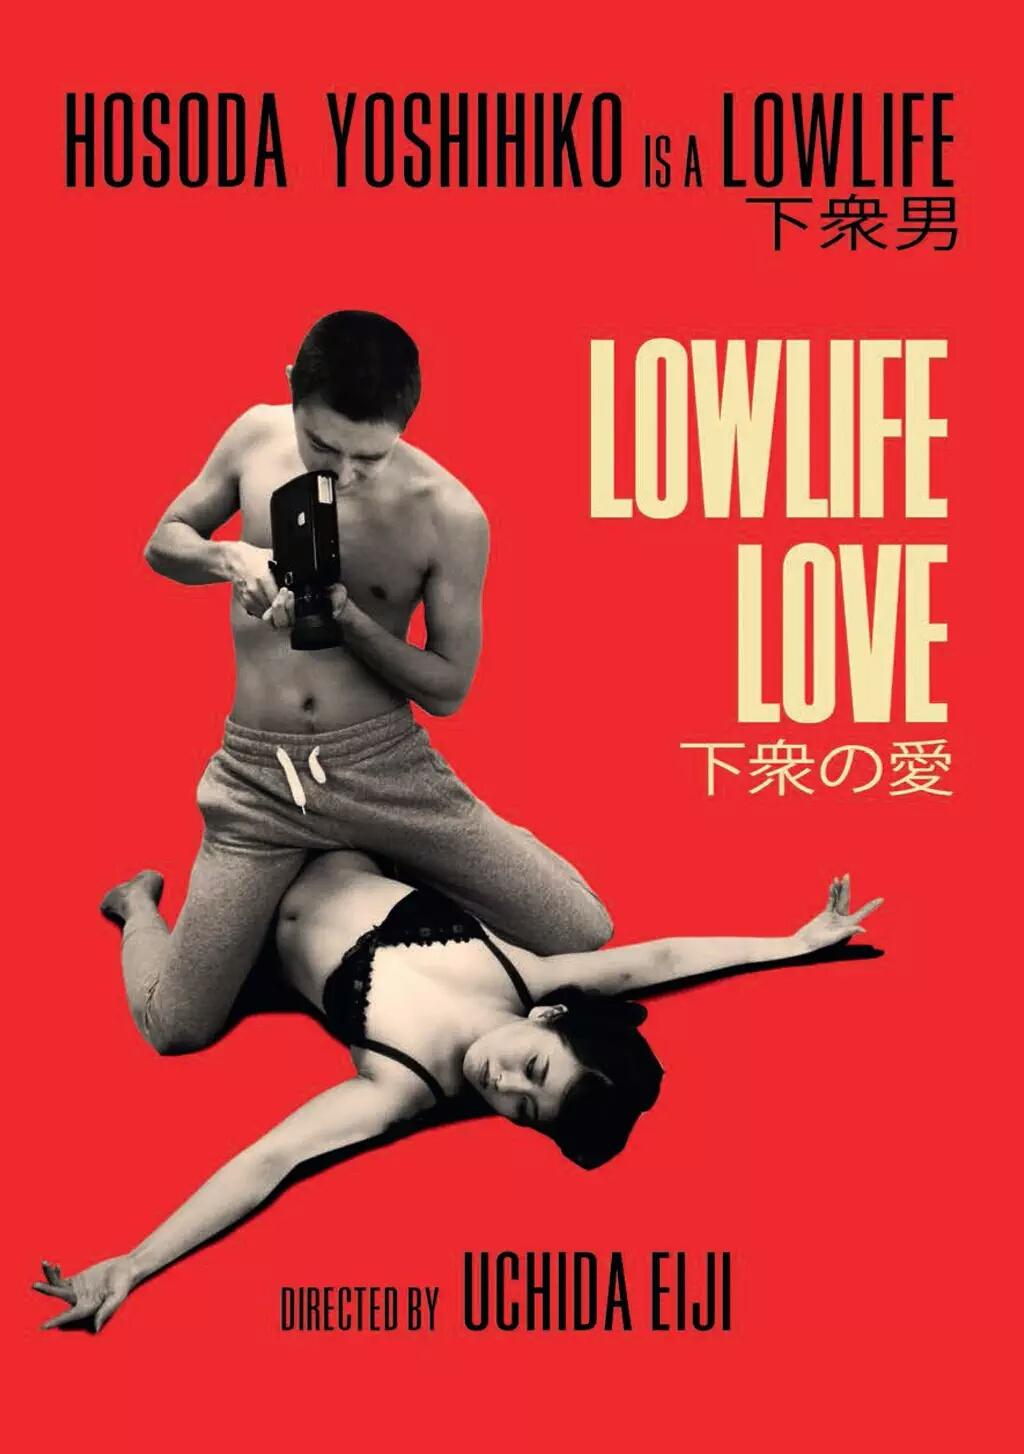 Lowlife-Love_poster_goldposter_com_2.jpg